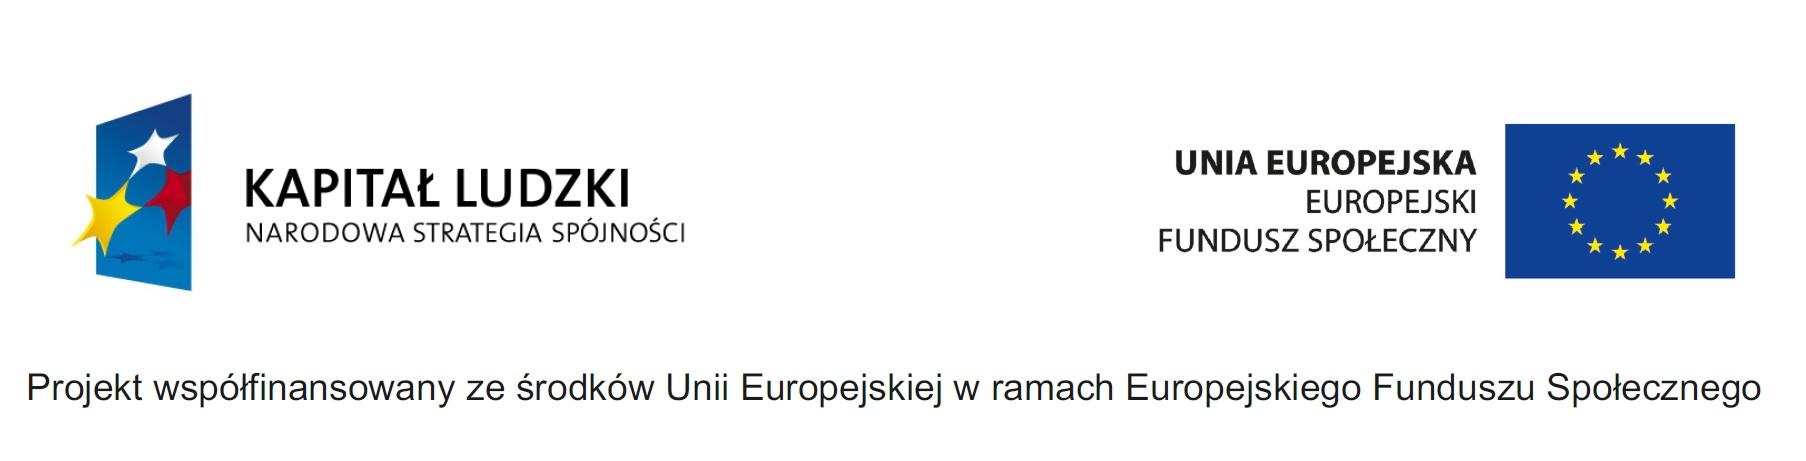 http://arleg.eu/wp-content/uploads/2013/03/logo-POKL-ue.jpg